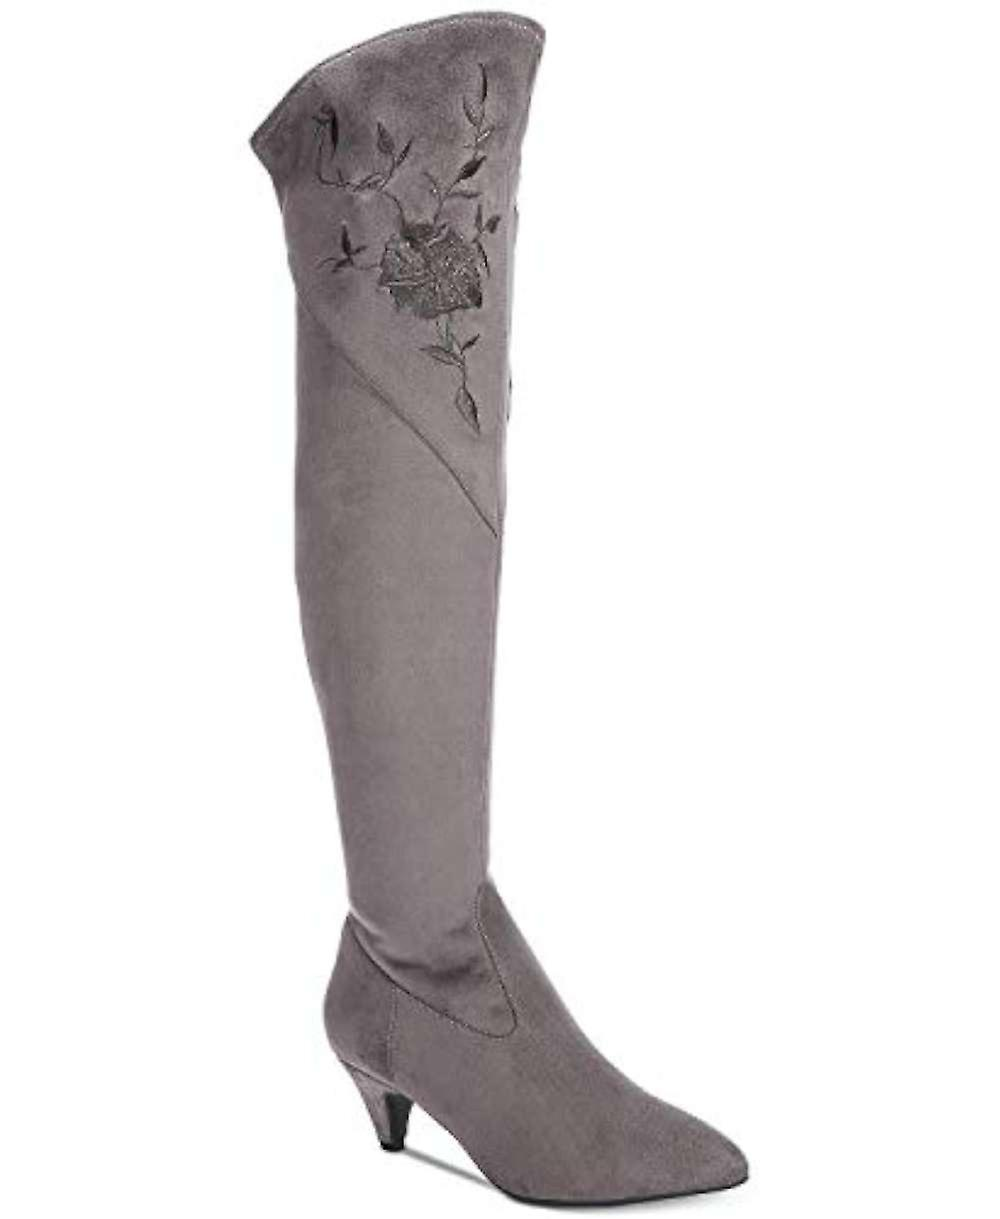 Impo Womens Edeva Closed Toe Knee High Fashion Boots gn1UE